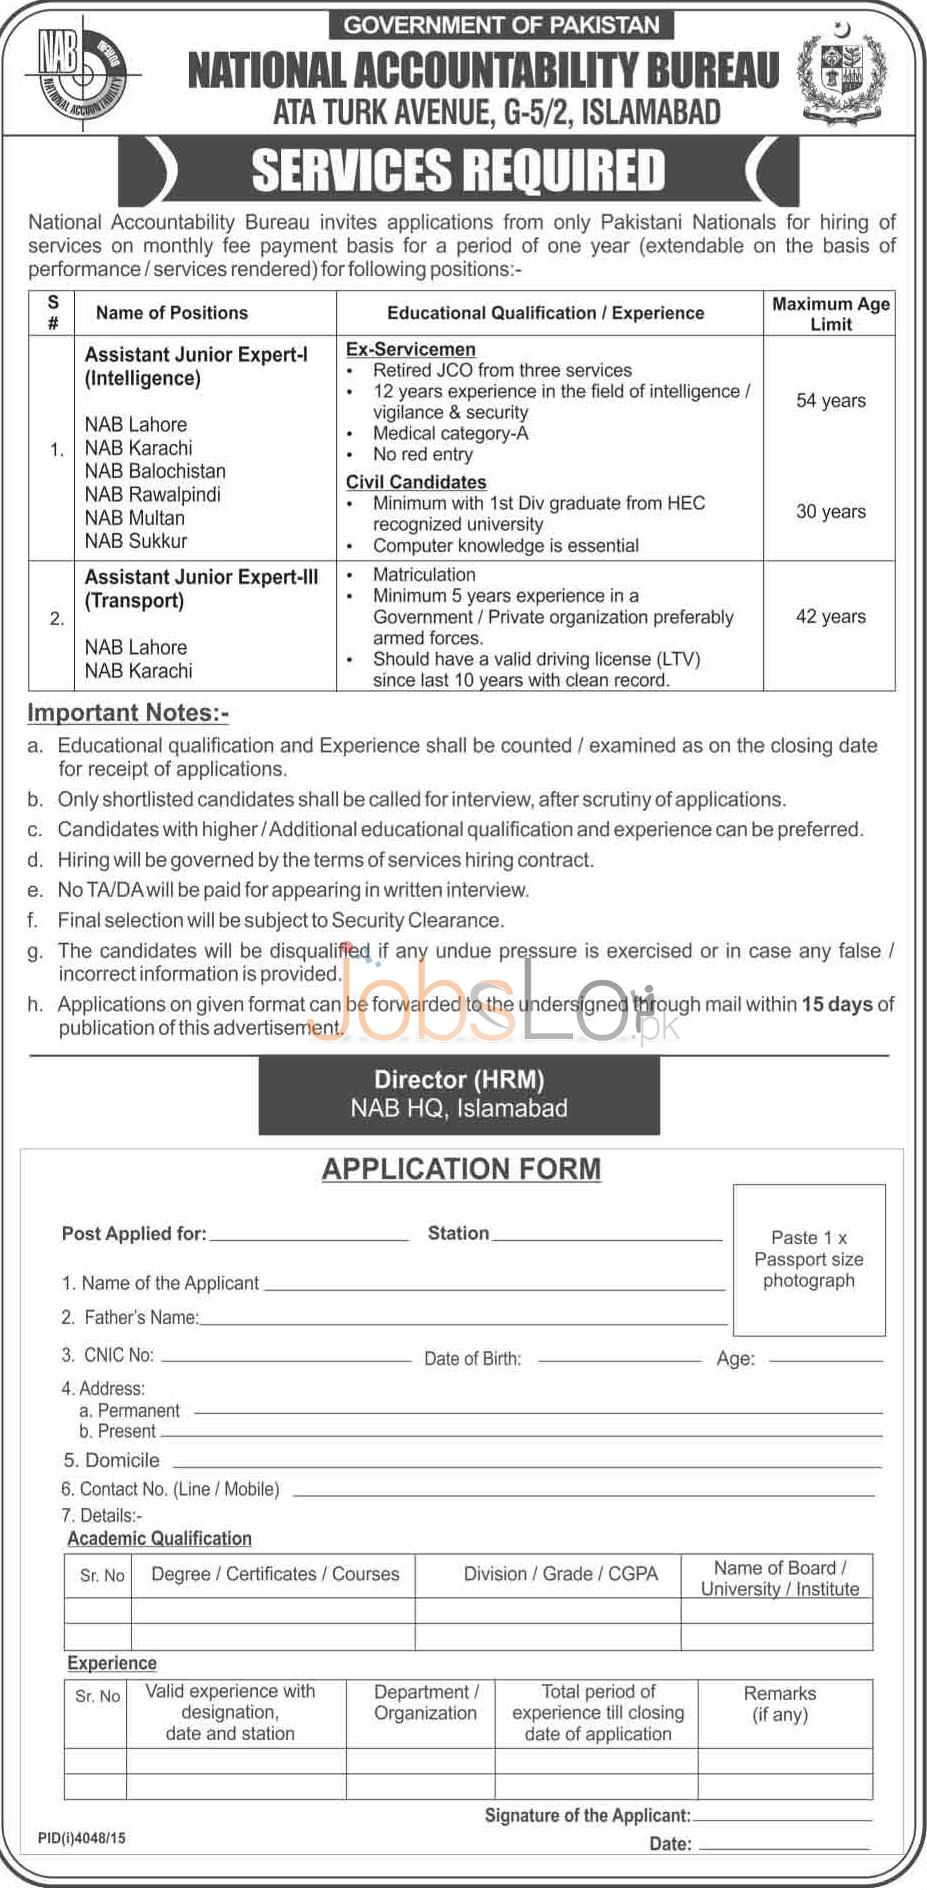 Job Vacancies in NAB Govt of Pakistan 4th February 2016 Sukkur, Multan, Balochistan